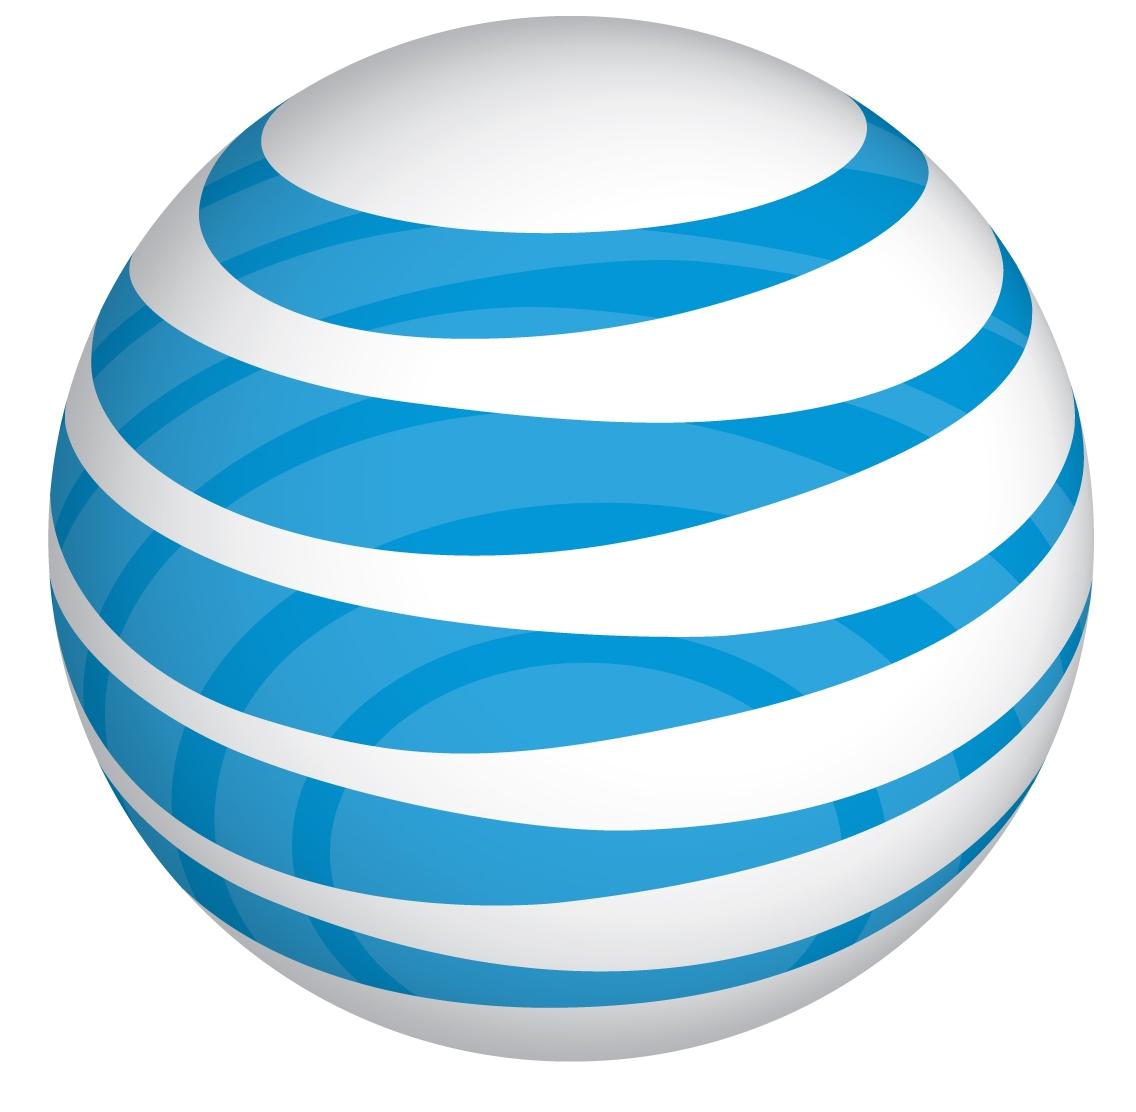 Att internet outage